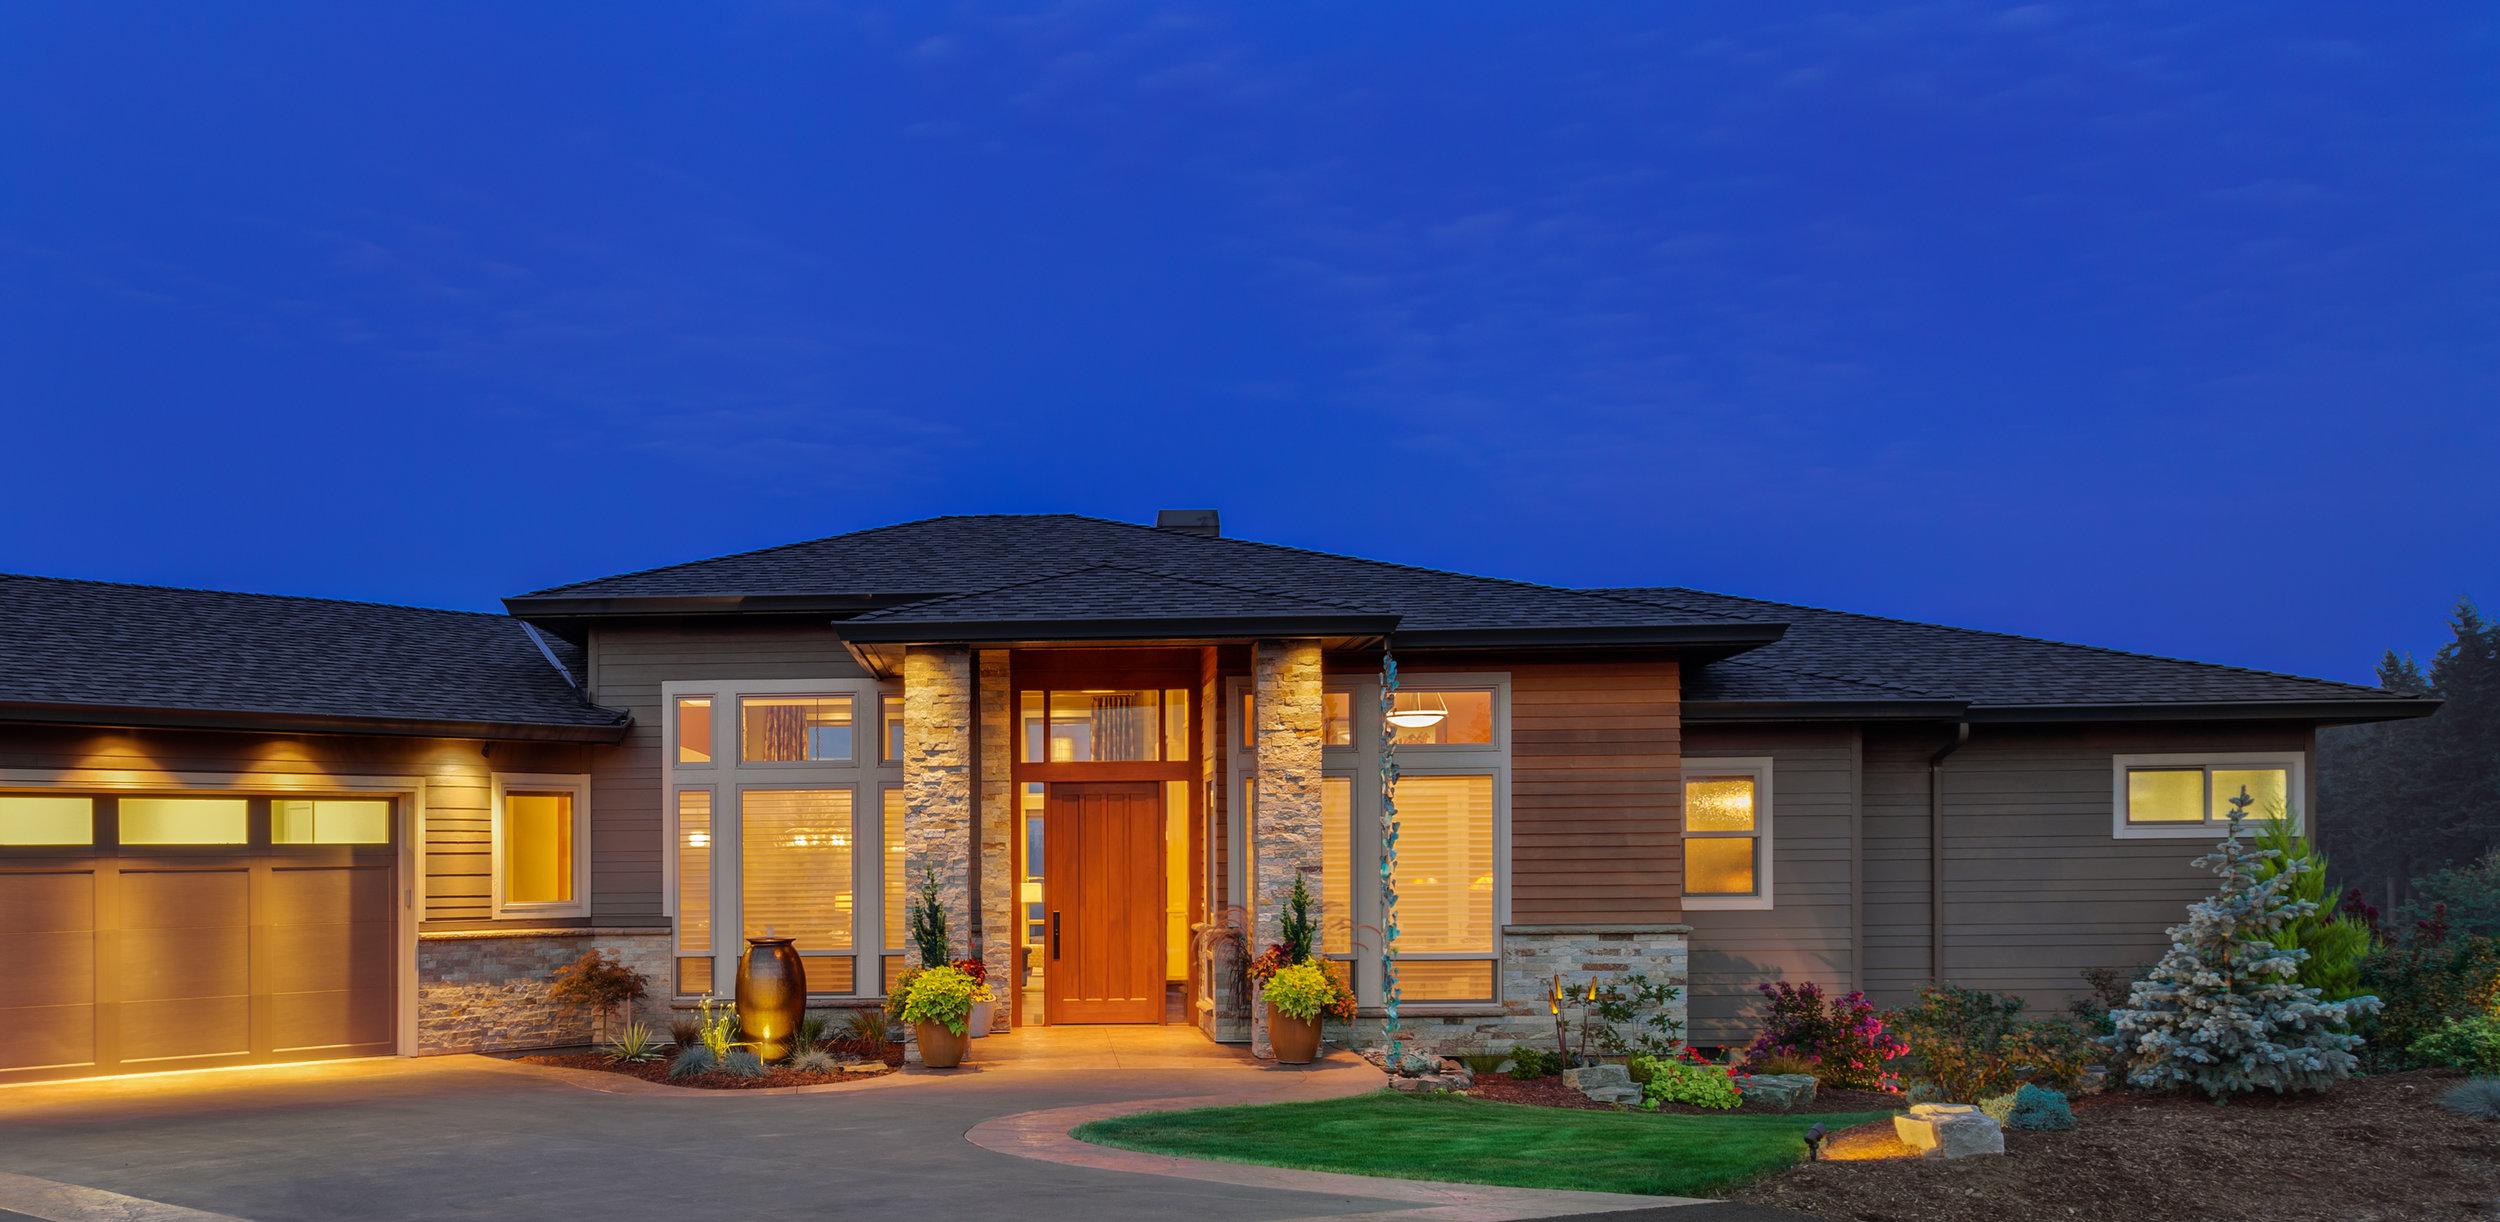 custom ranch home.jpg